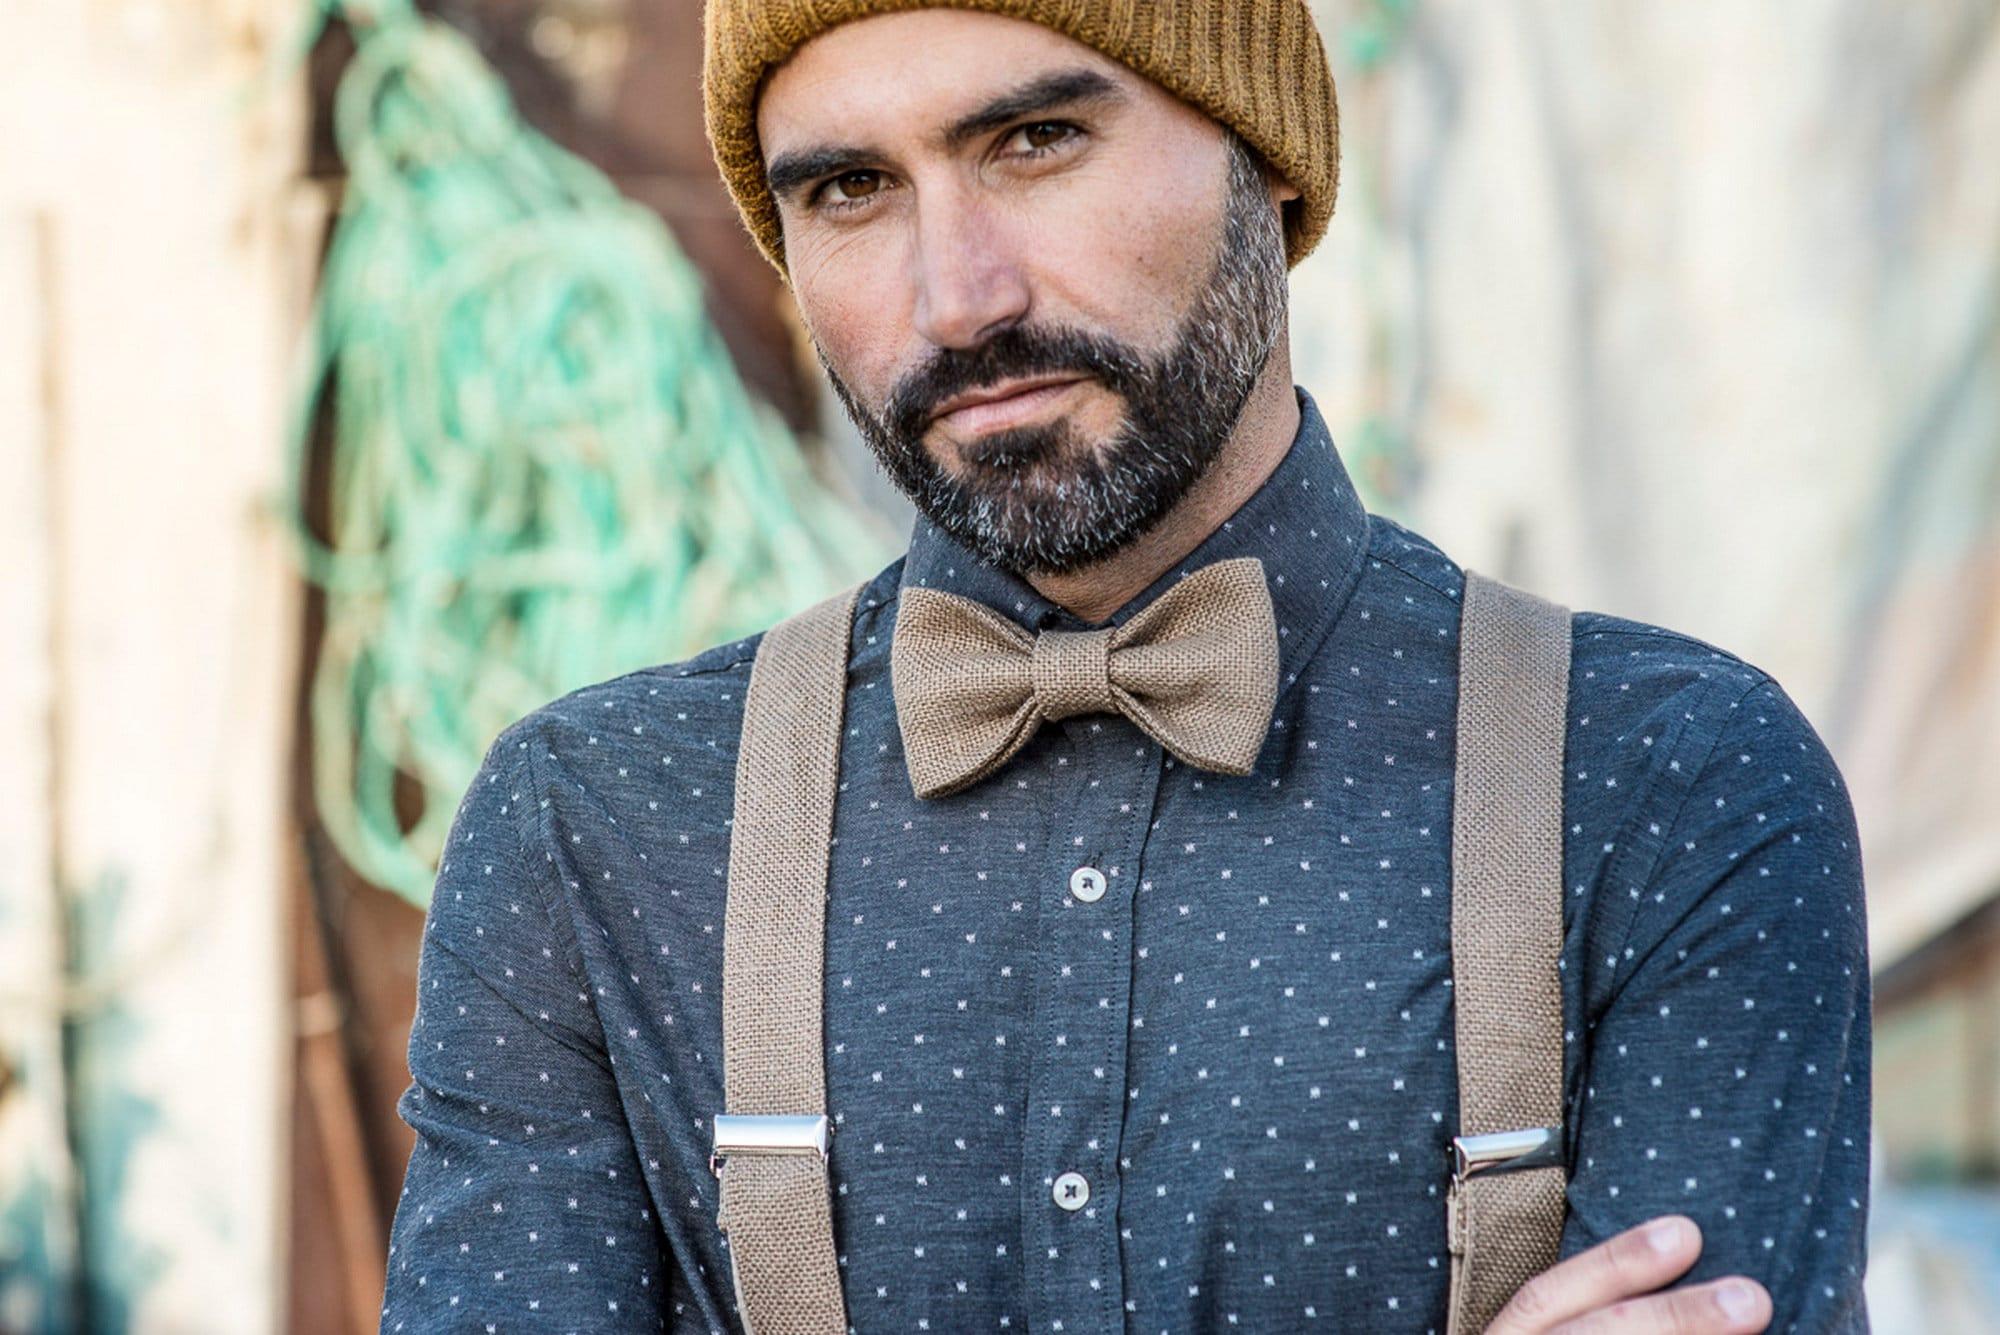 d640fc9a56d4 Groom wedding suspenders and suit bow tie, wedding outfit, suit suspenders  set, groom outfit 2018, adult suspenders set, pure linen braces